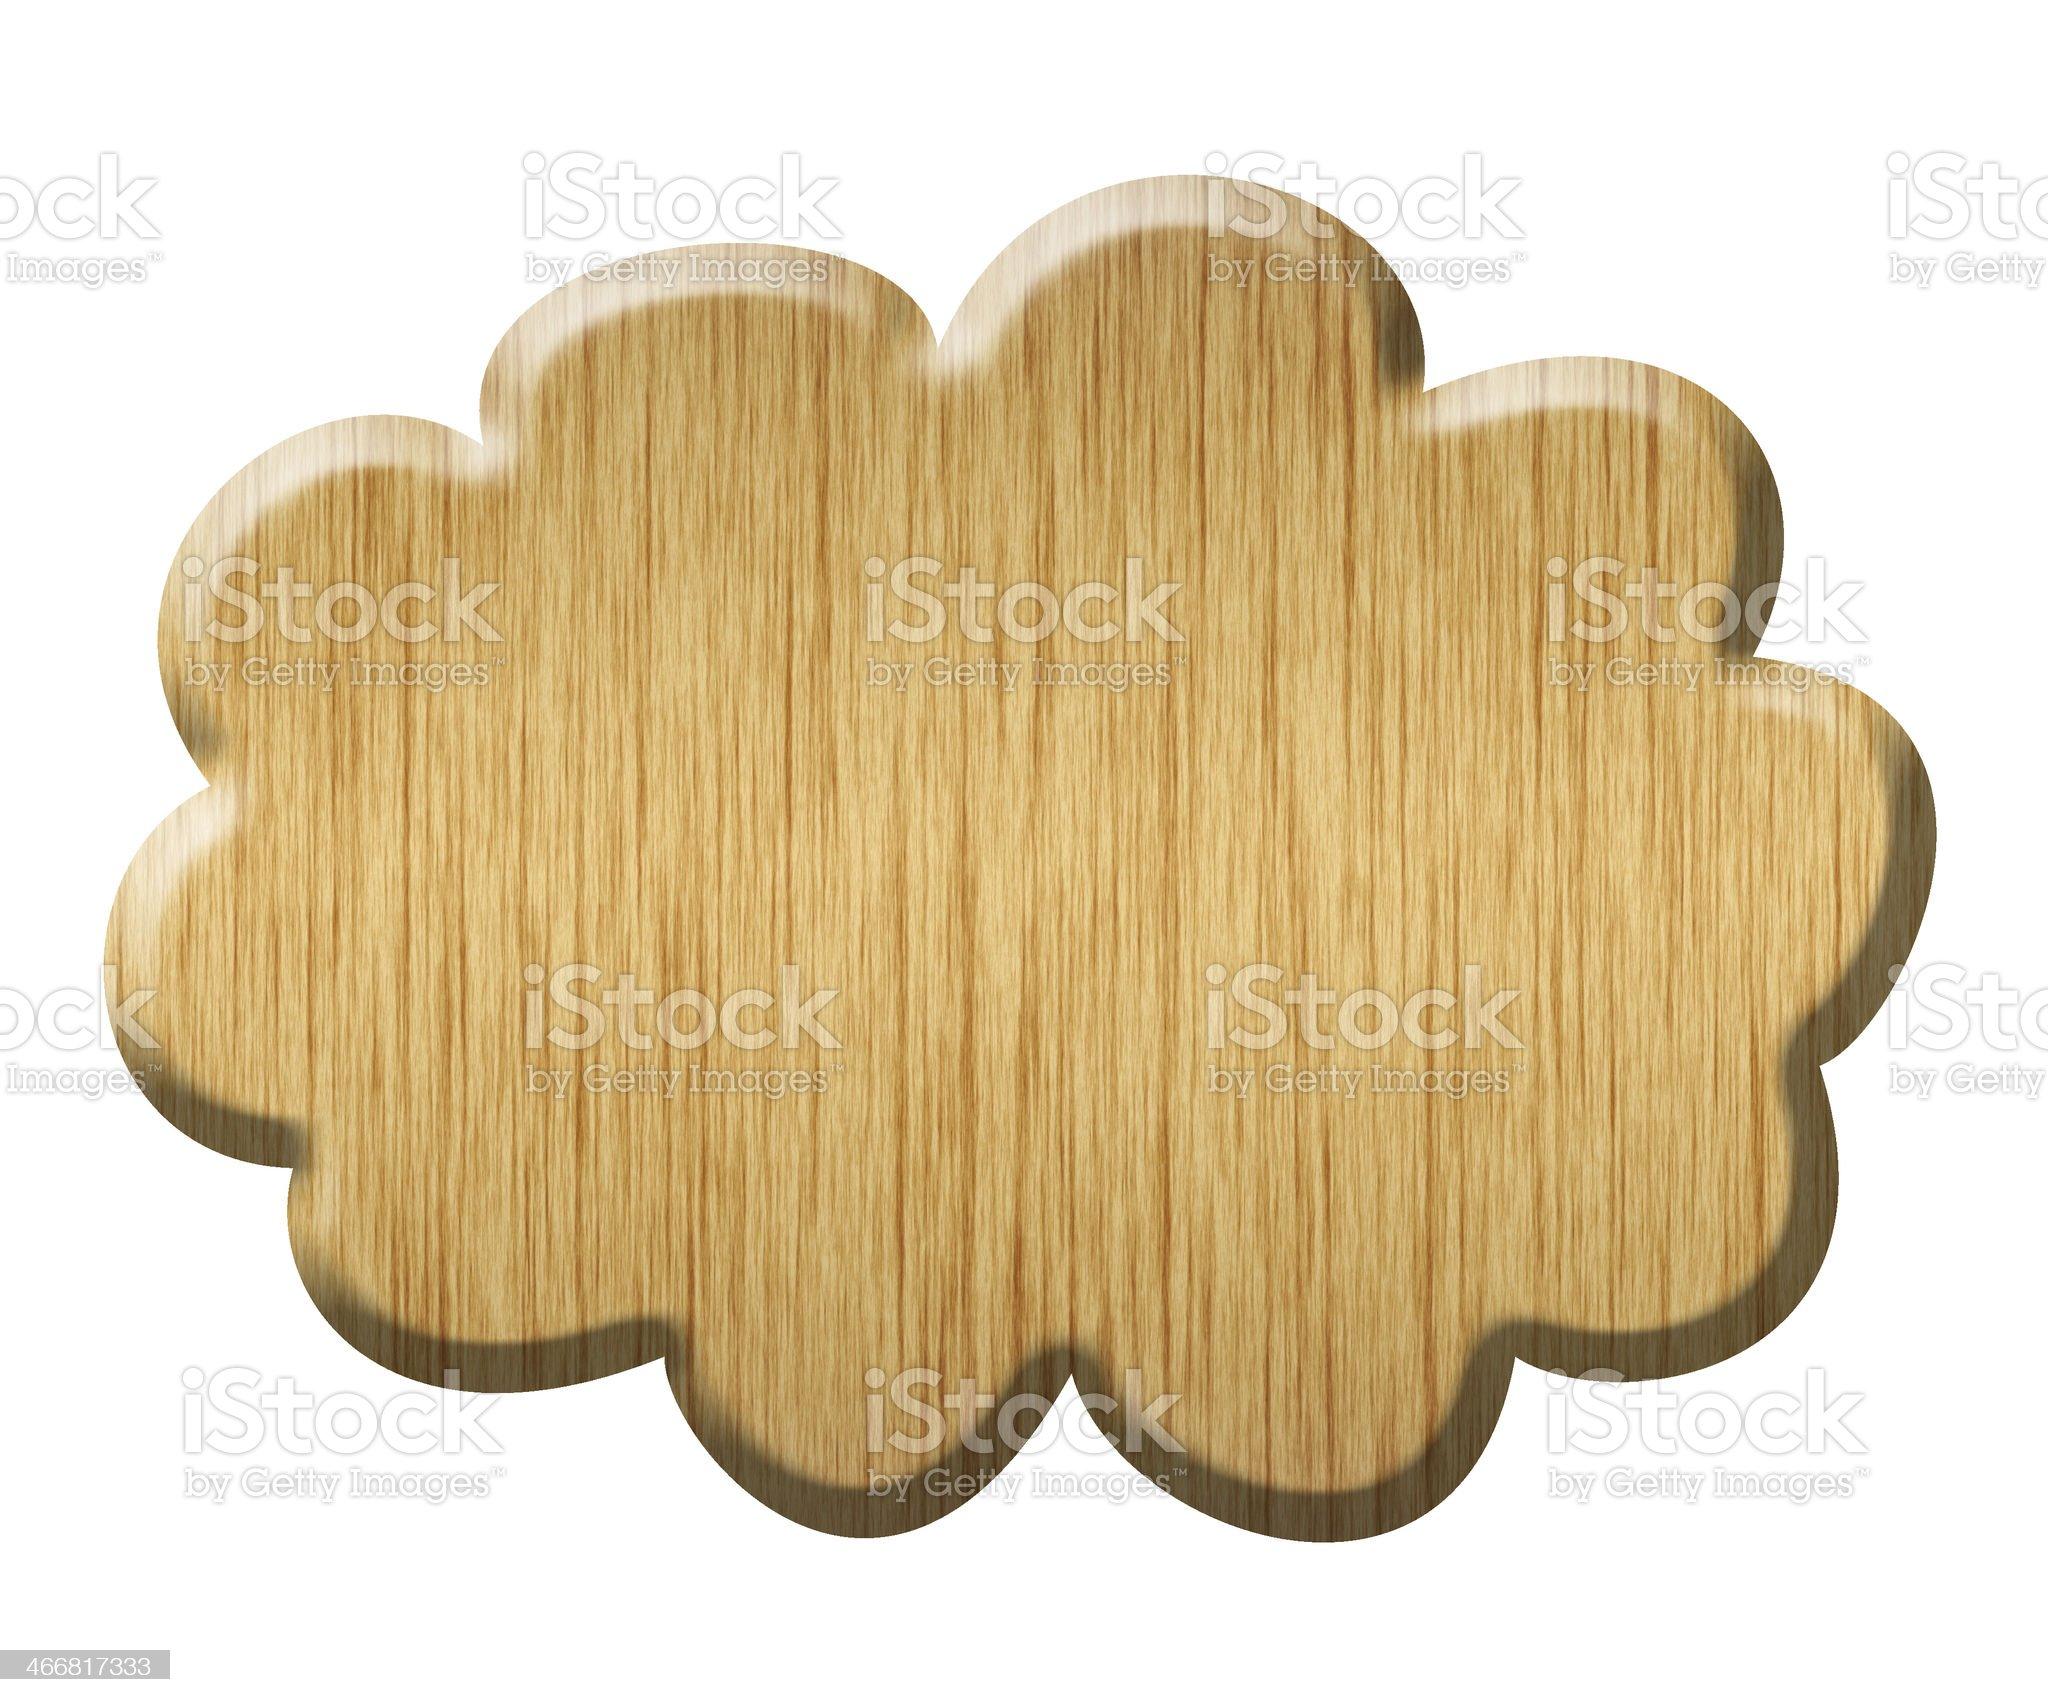 Cloud wood royalty-free stock photo